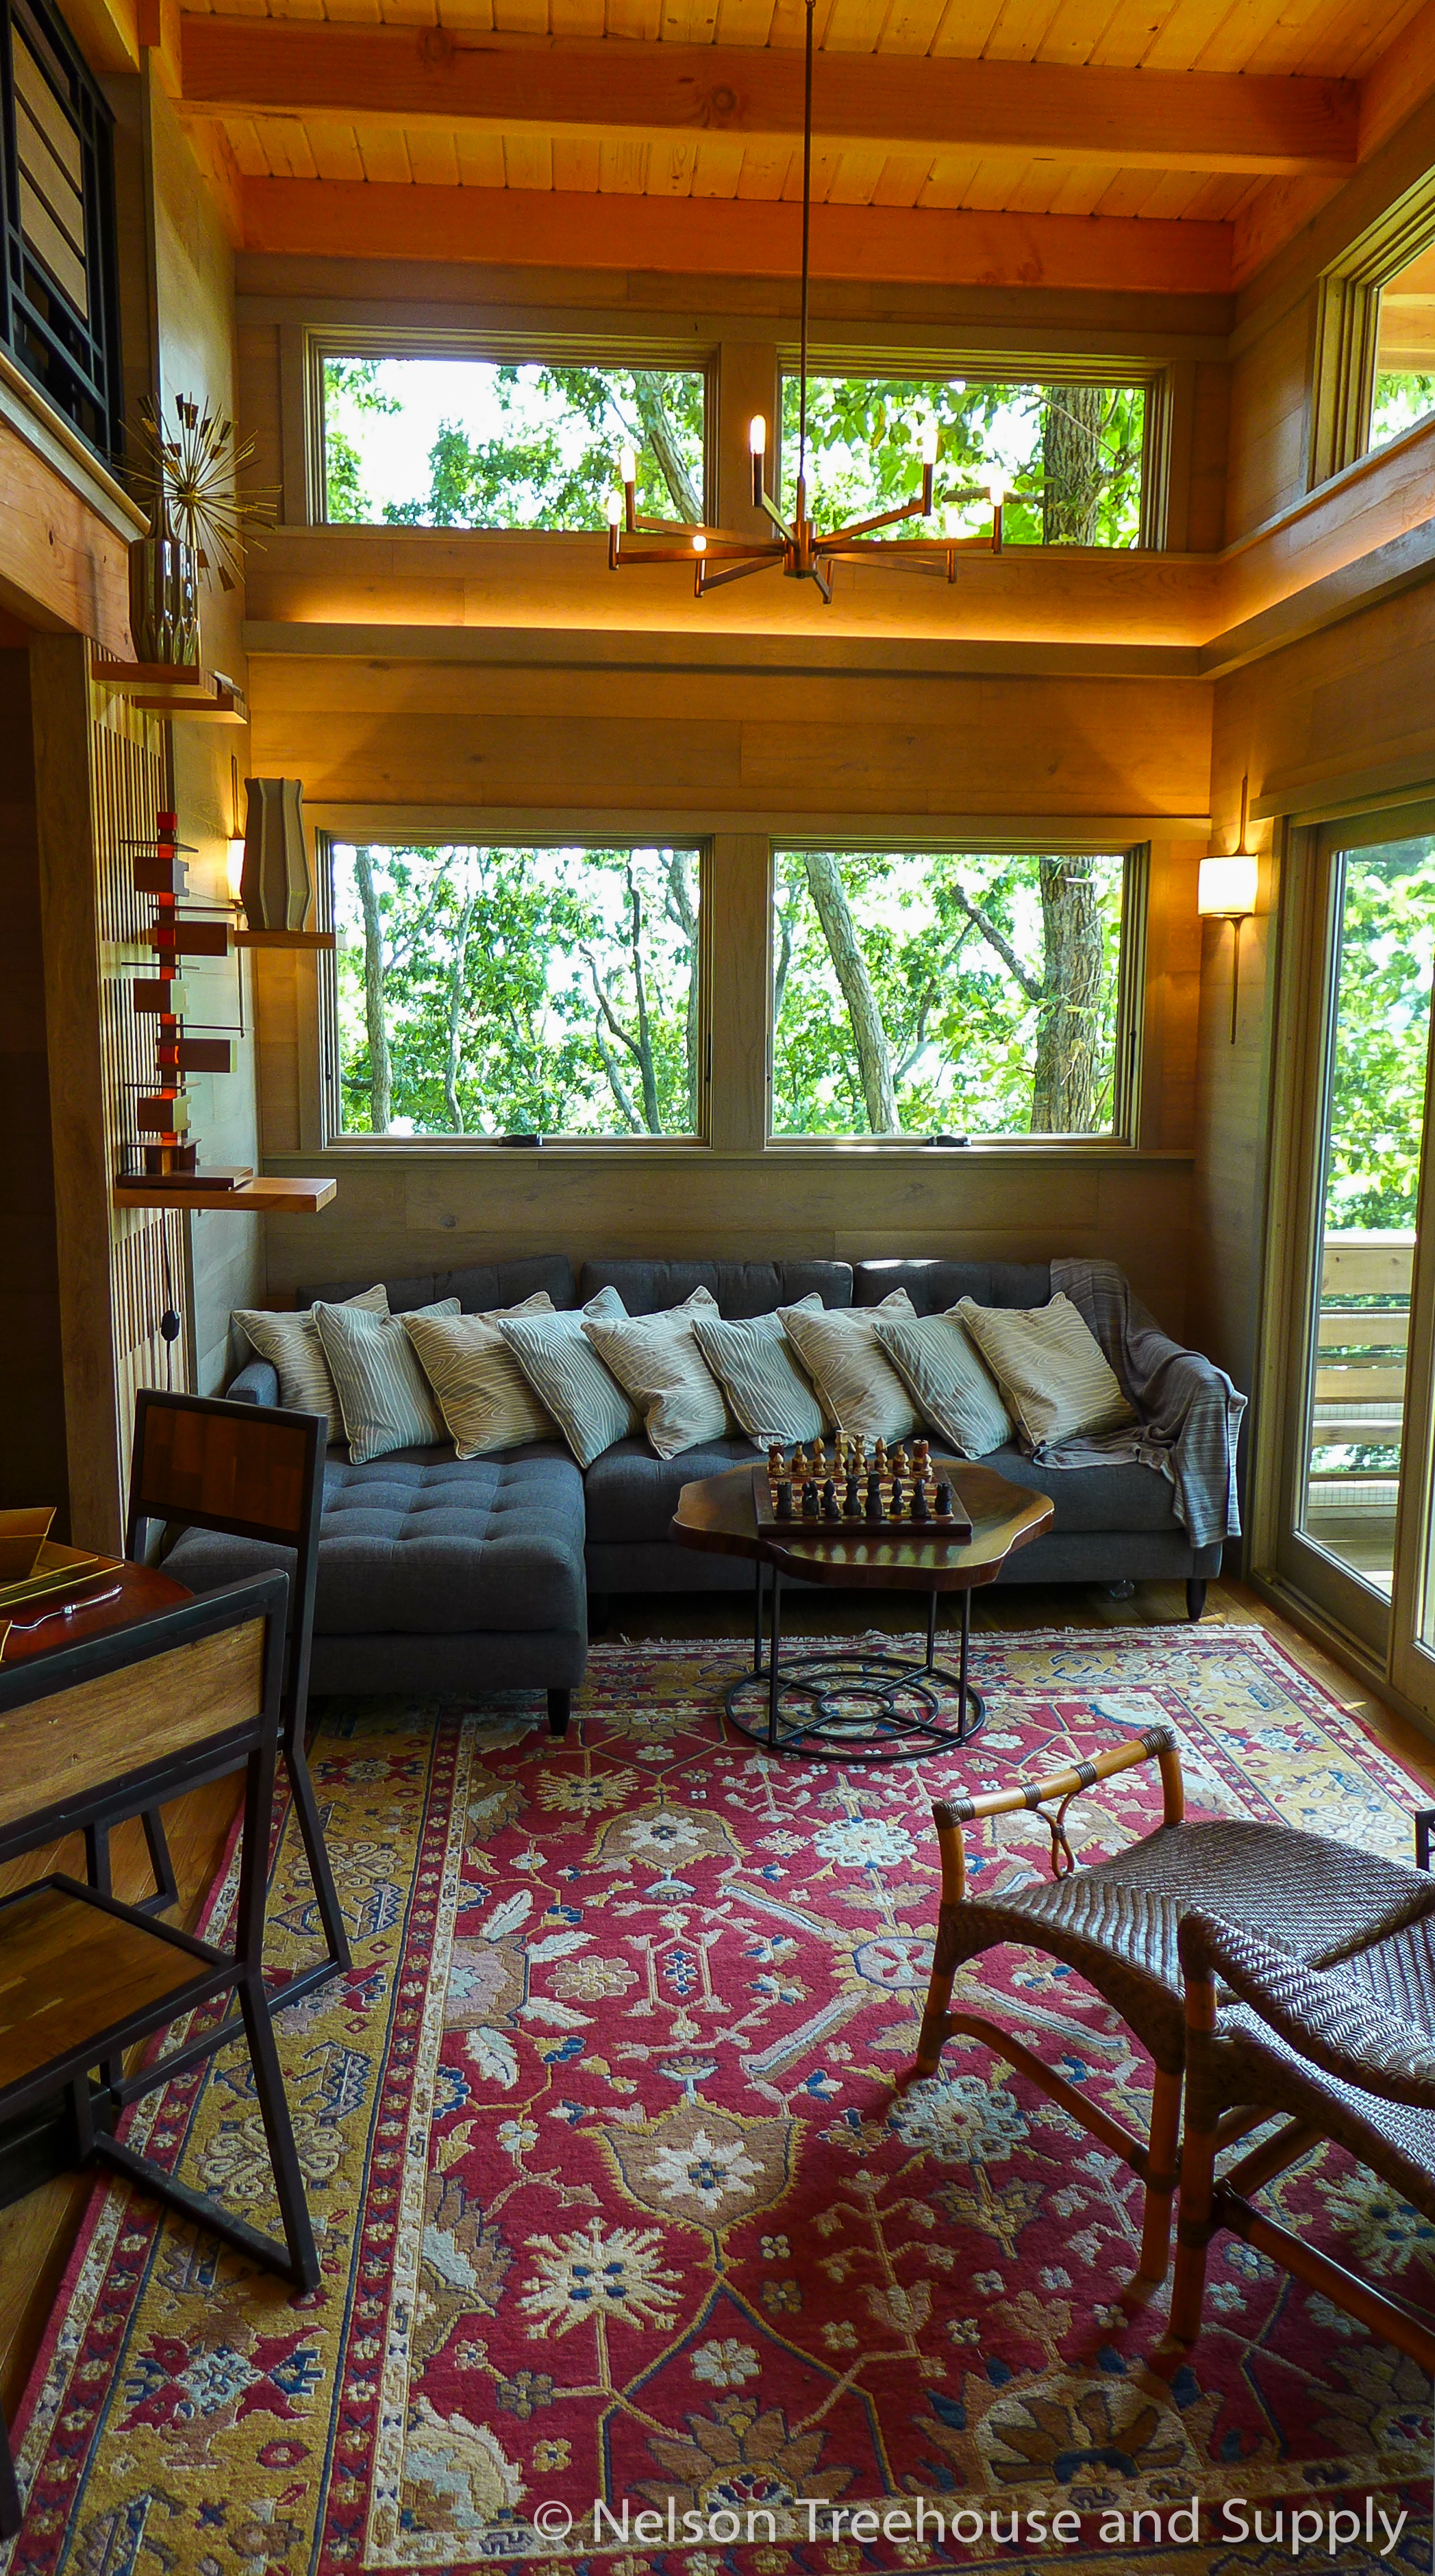 frank-lloyd-wright-treehouse-living-room